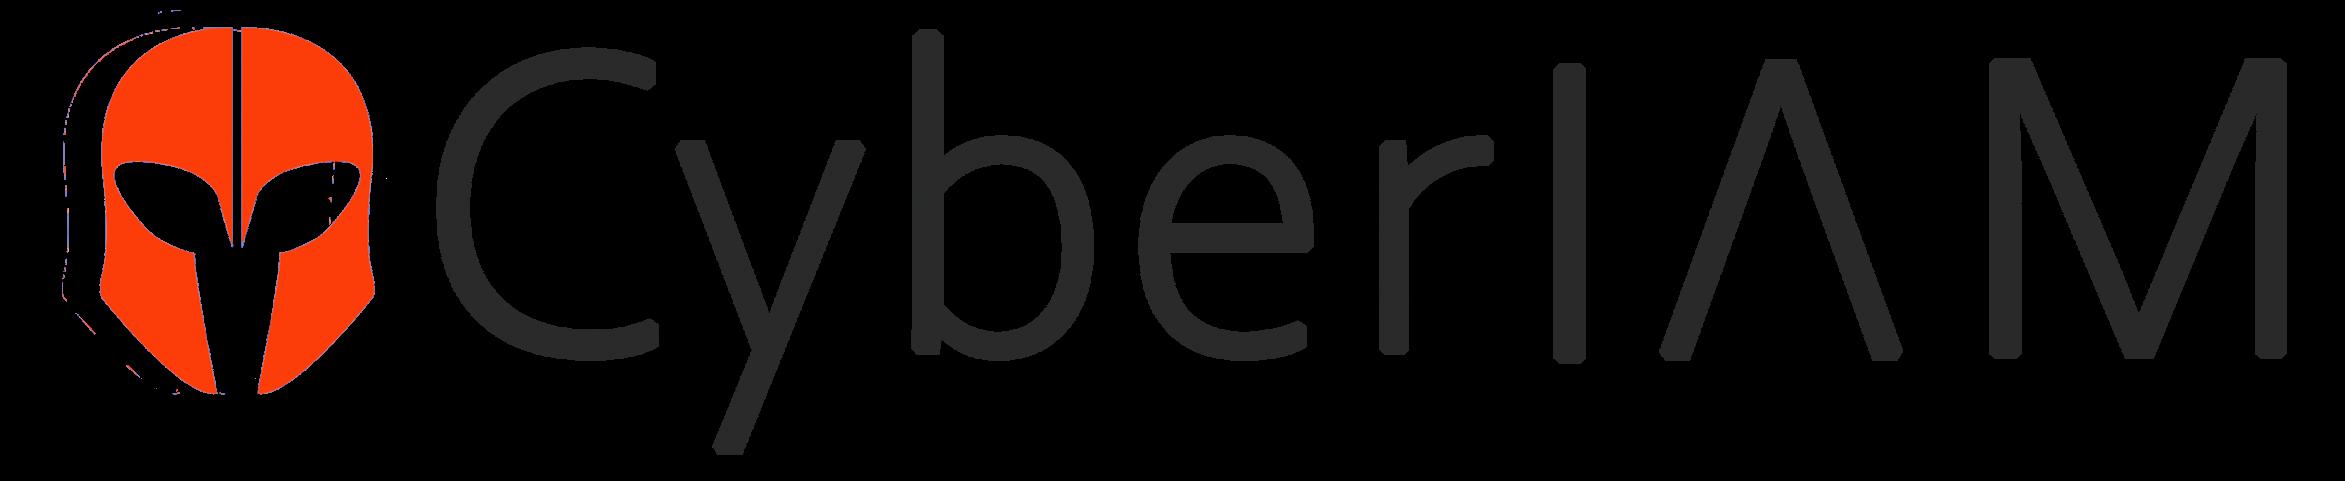 CyberIAM logo